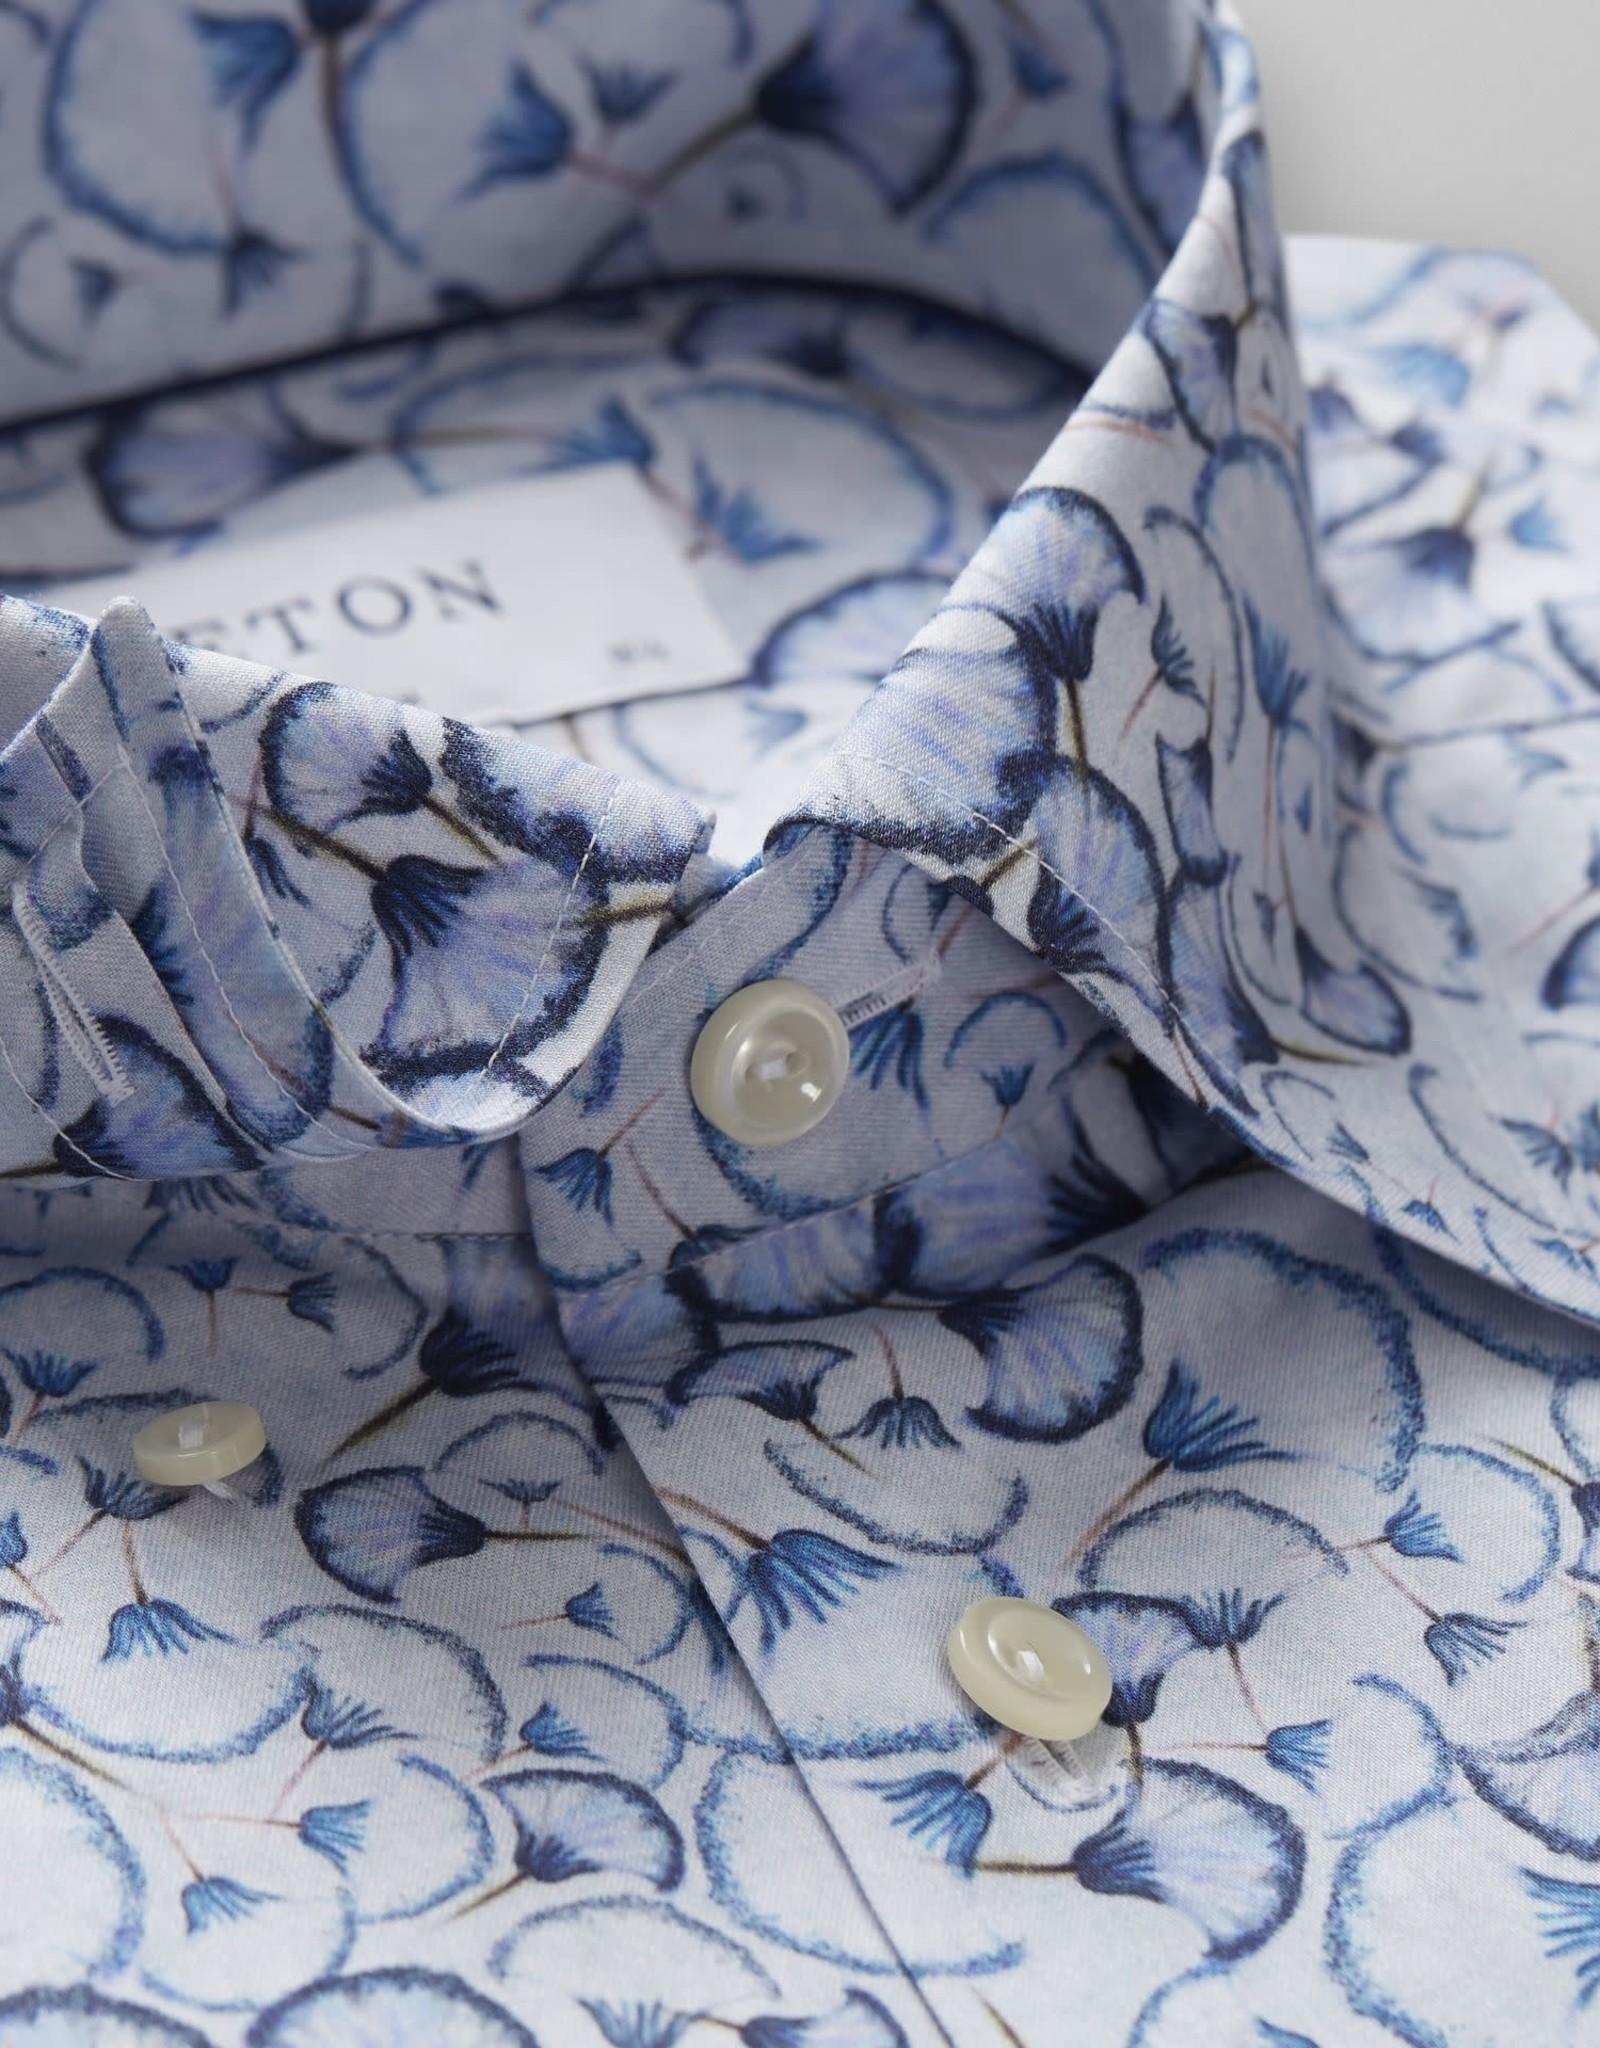 Eton Eton Contemporary Fit Dress Shirt Blue Dandelion Print